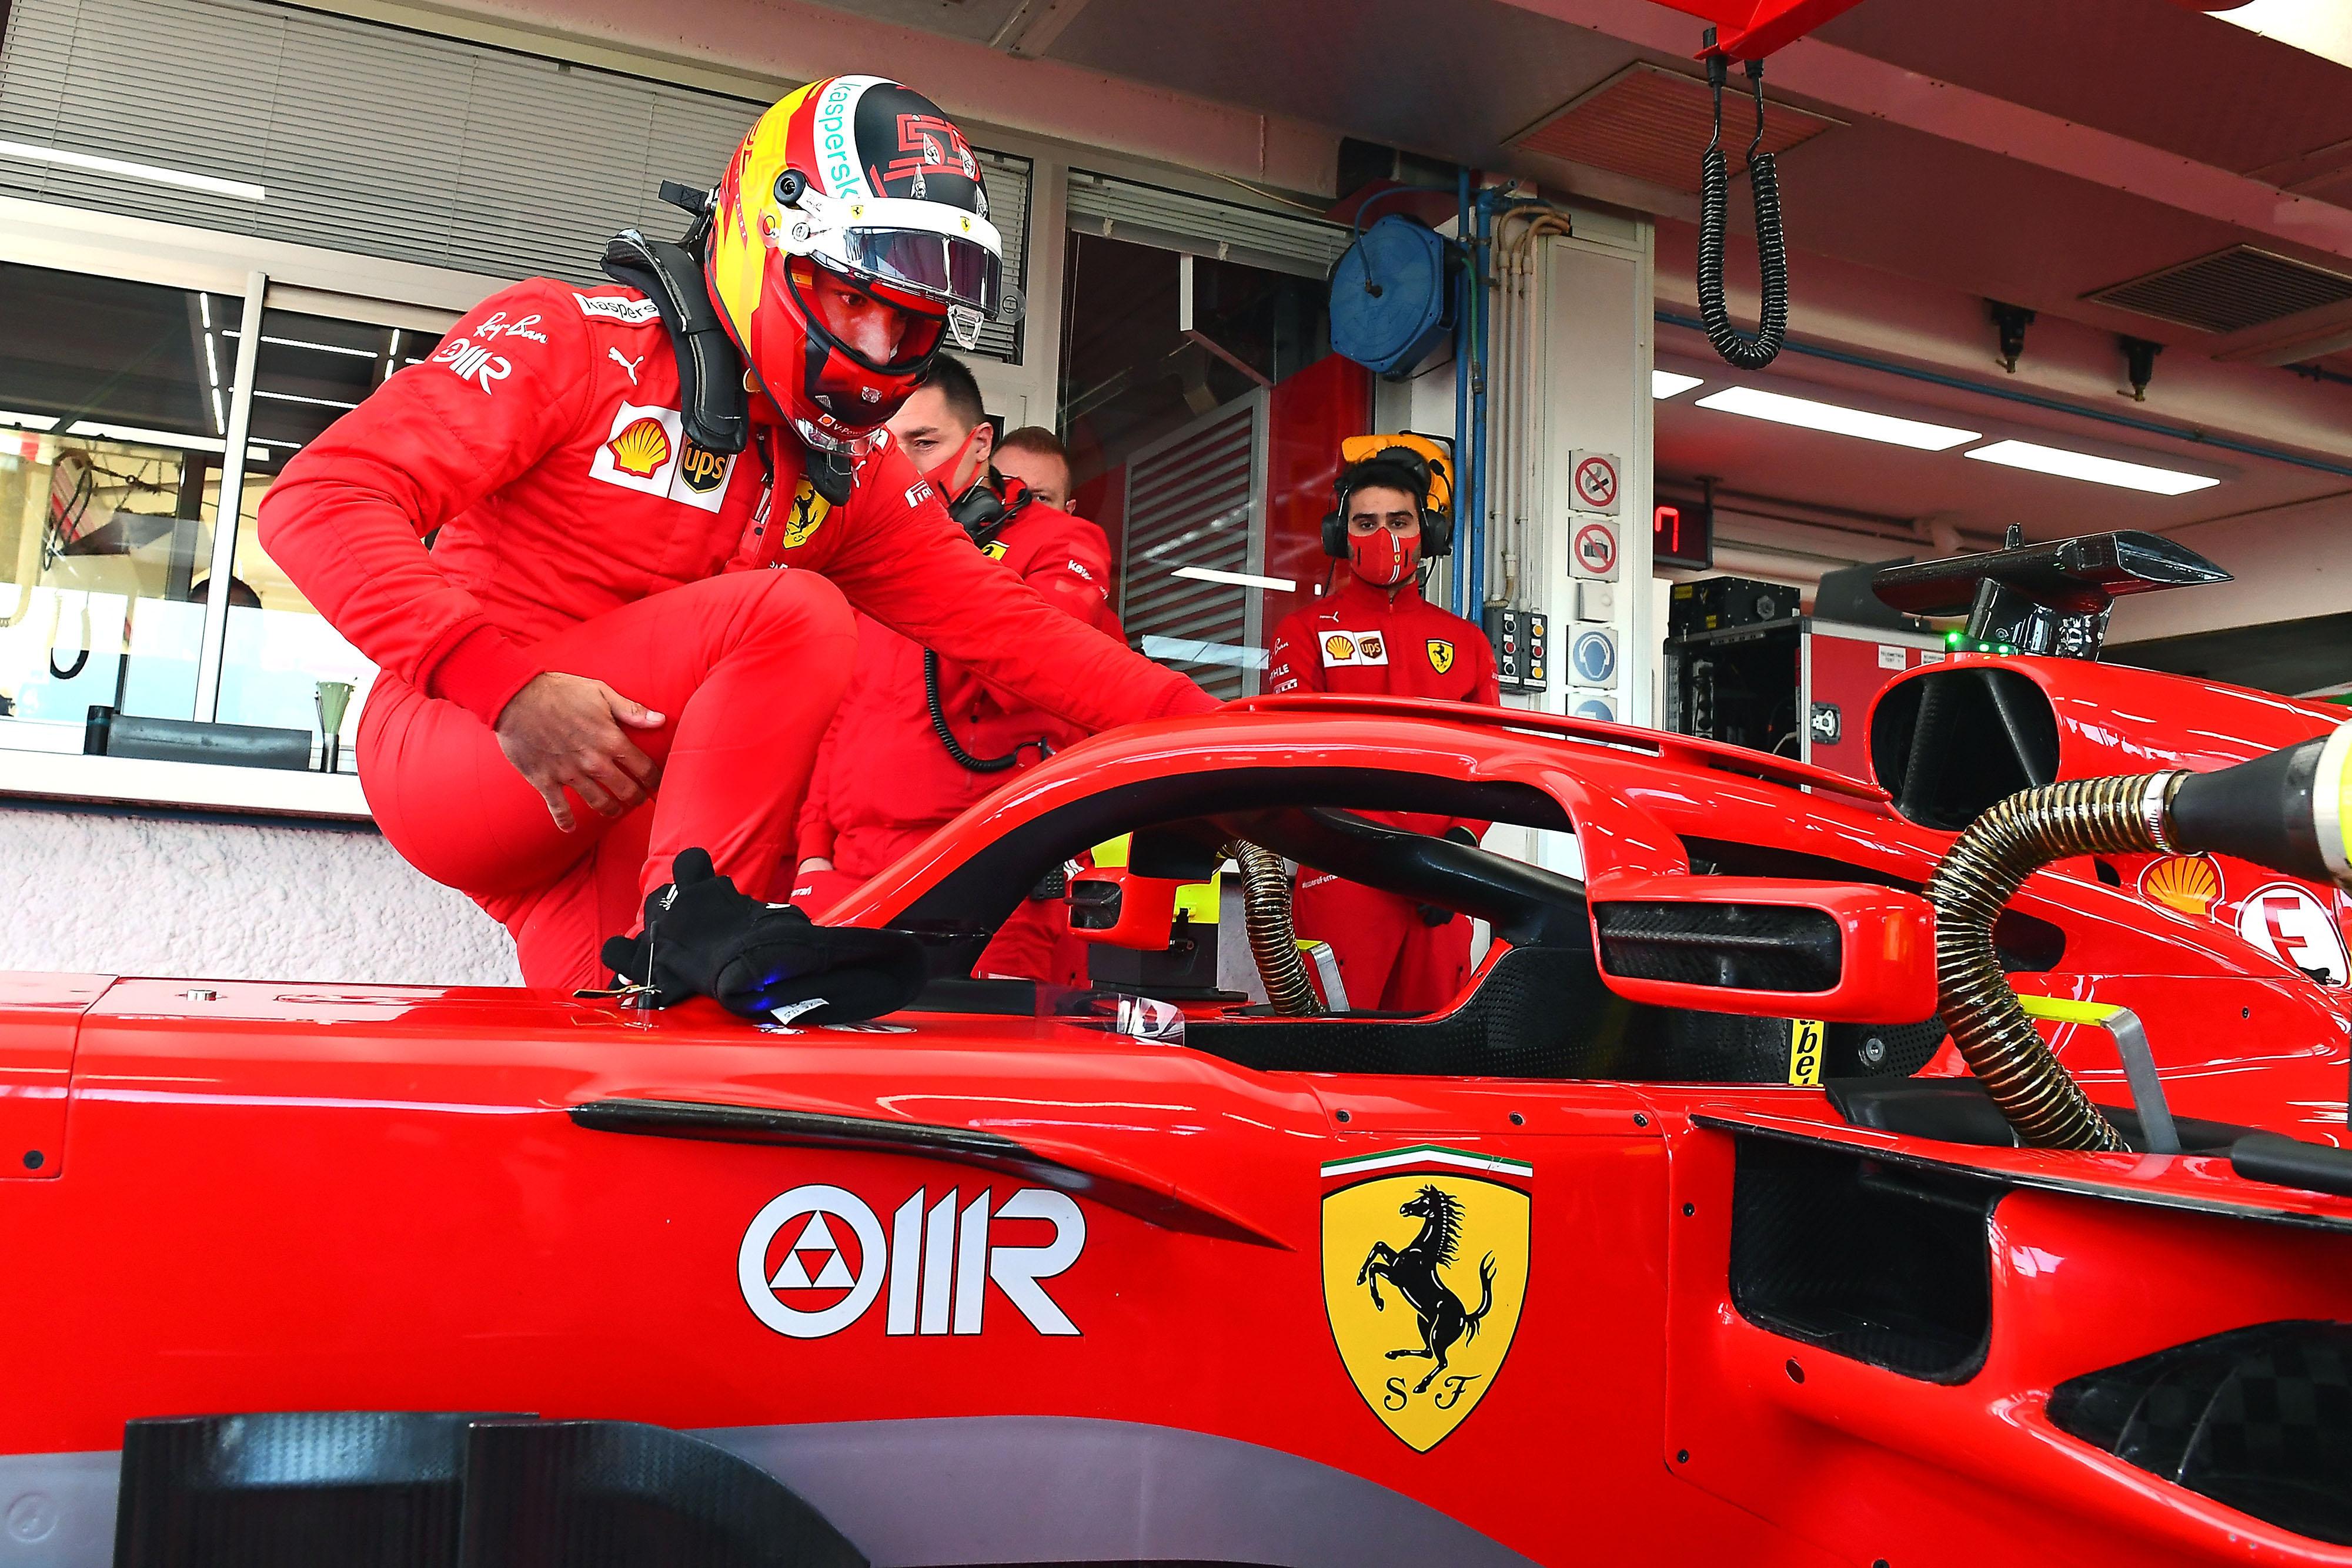 FERRARI F1 TEST FIORANO - MERCOLEDI 27/01/2021 credit: @Scuderia Ferrari Press Office